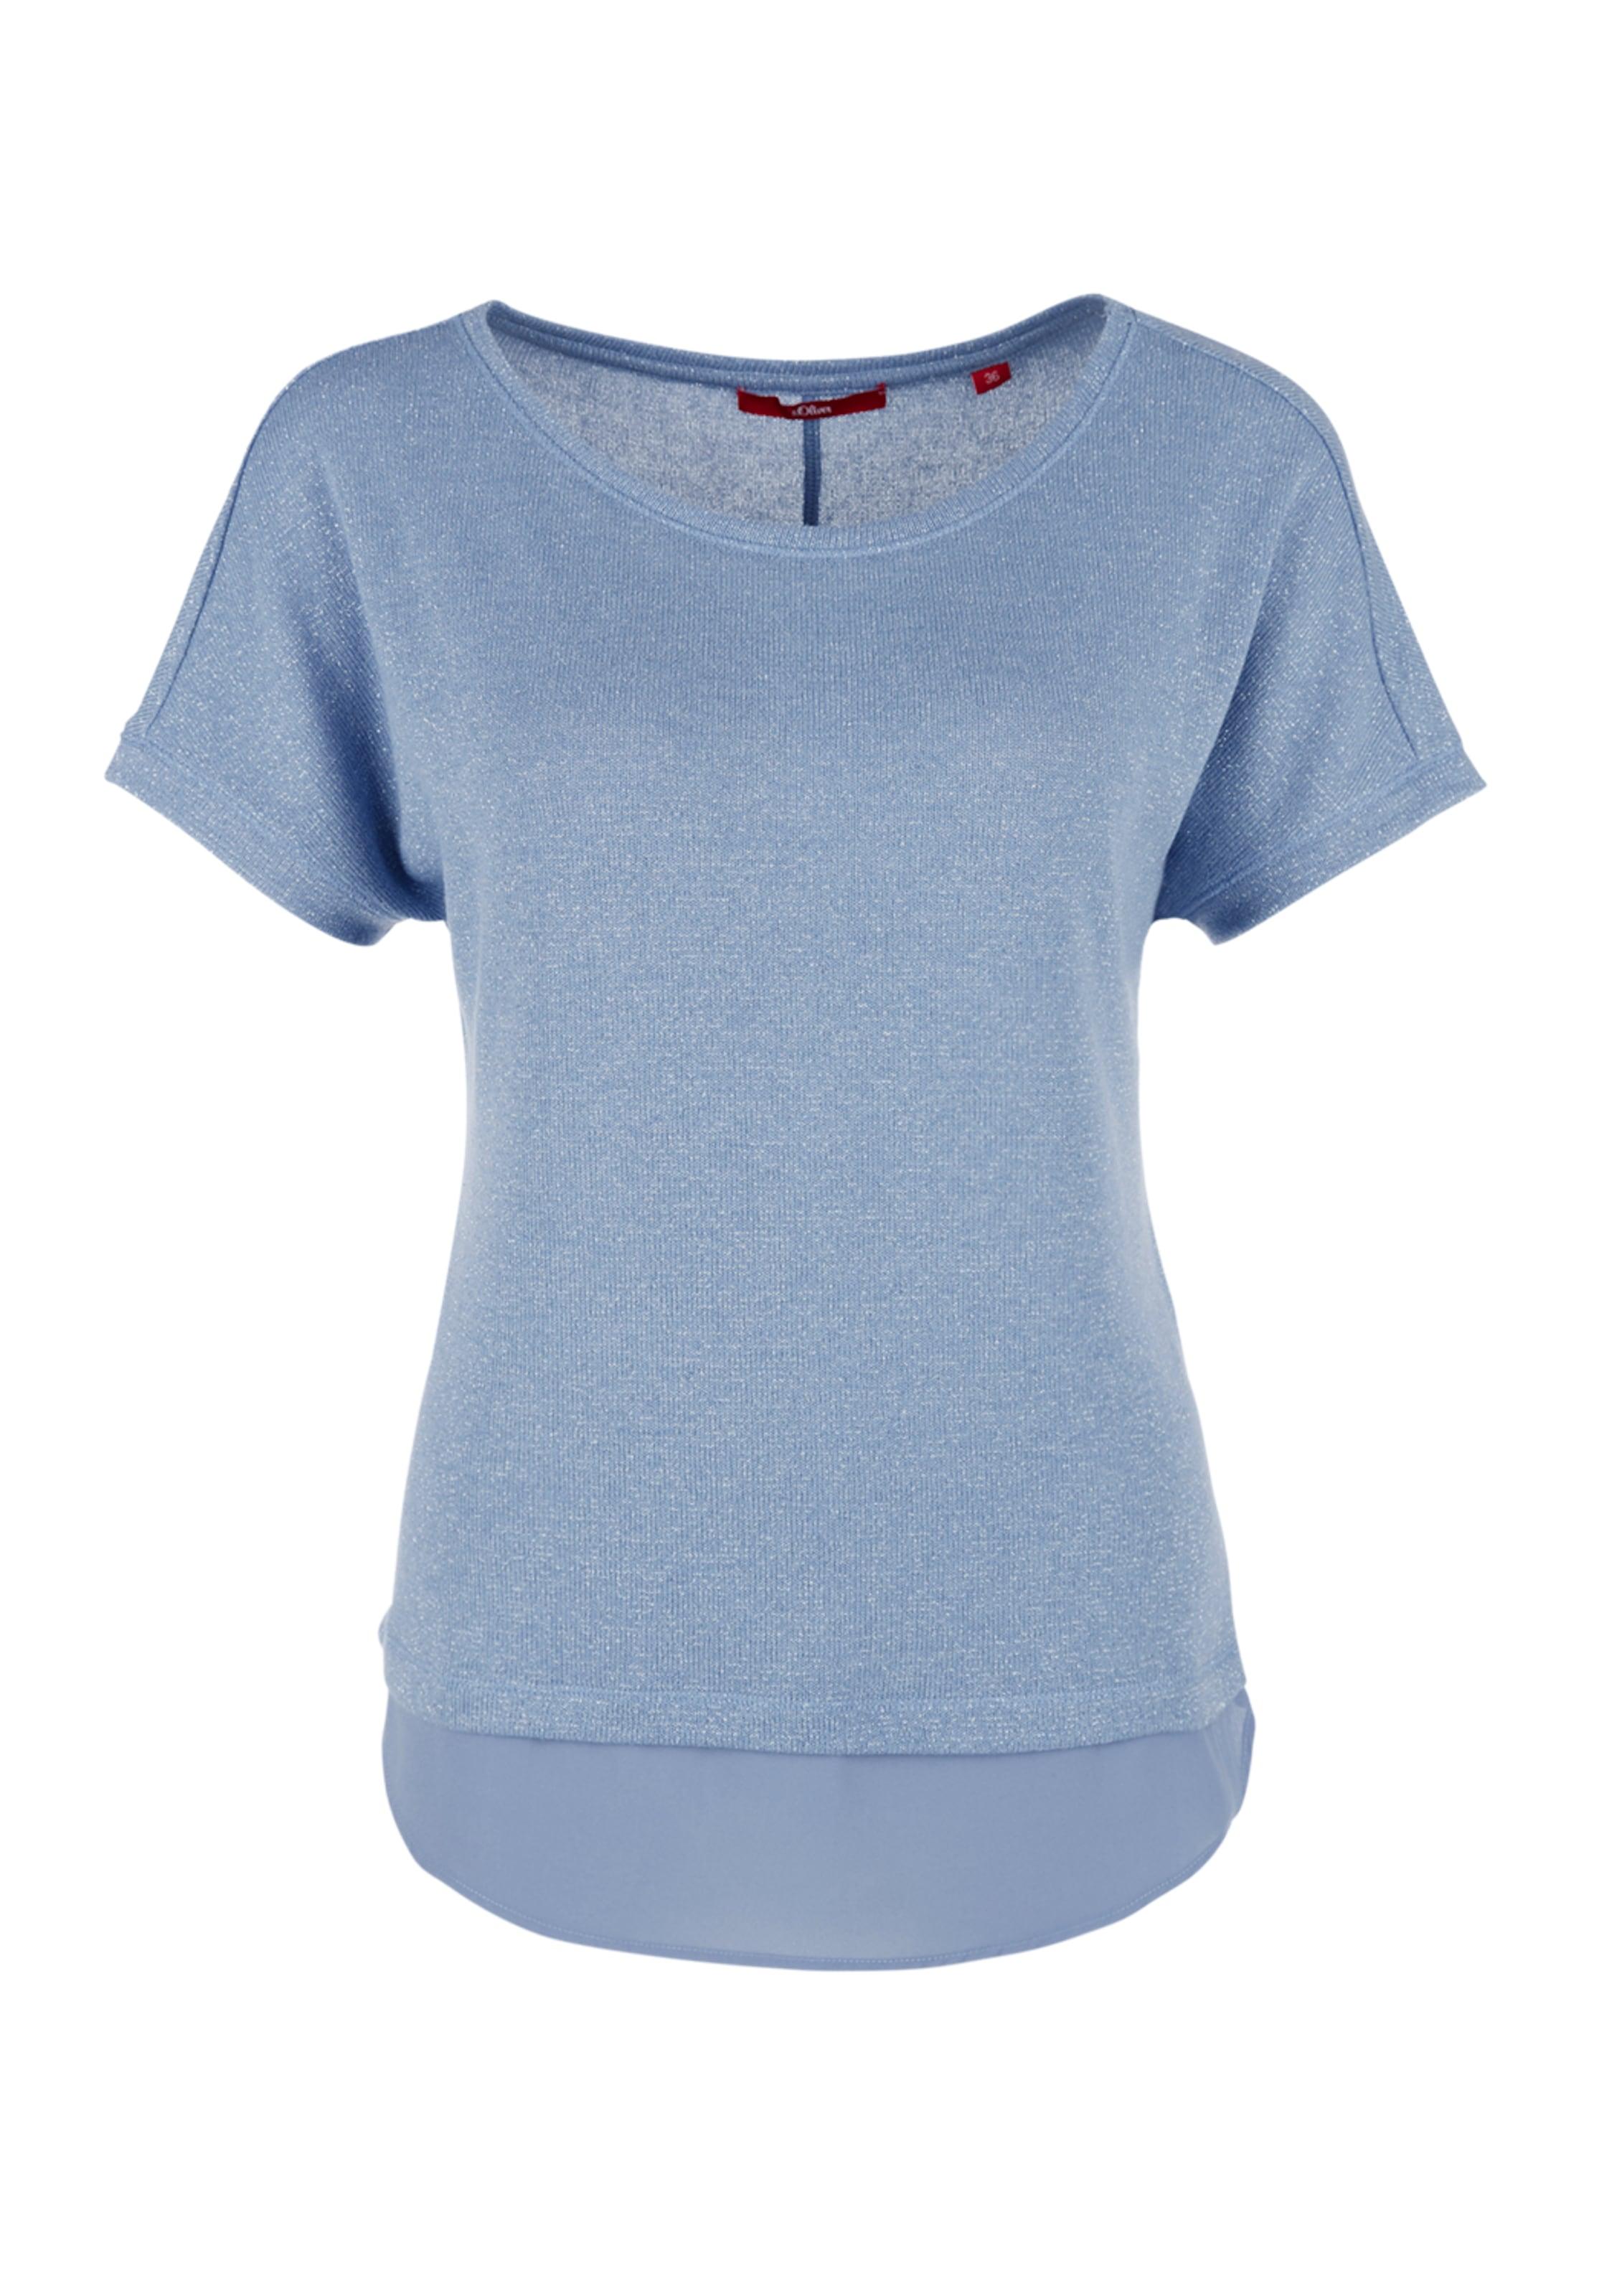 Rauchblau Shirt S oliver Label Red In 8OXkNnwZ0P